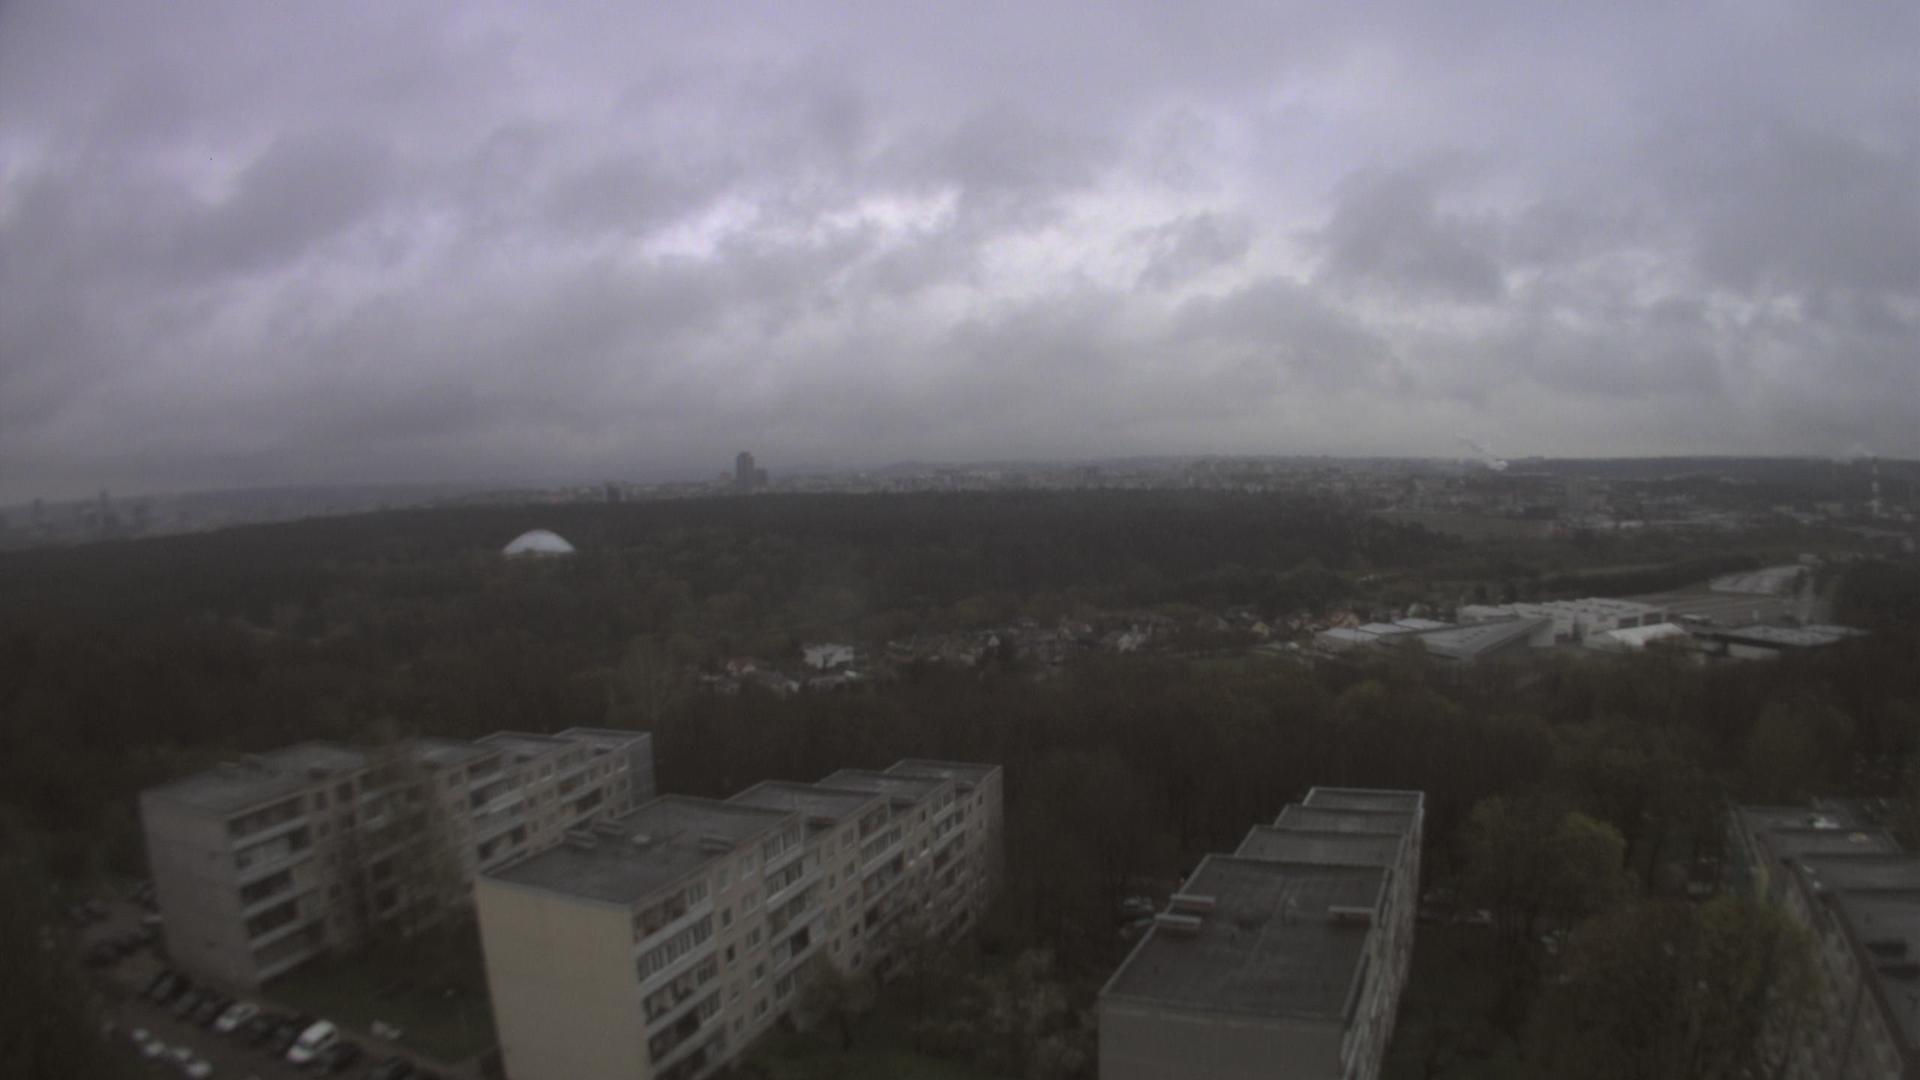 Webkamera Lazdynai: Live